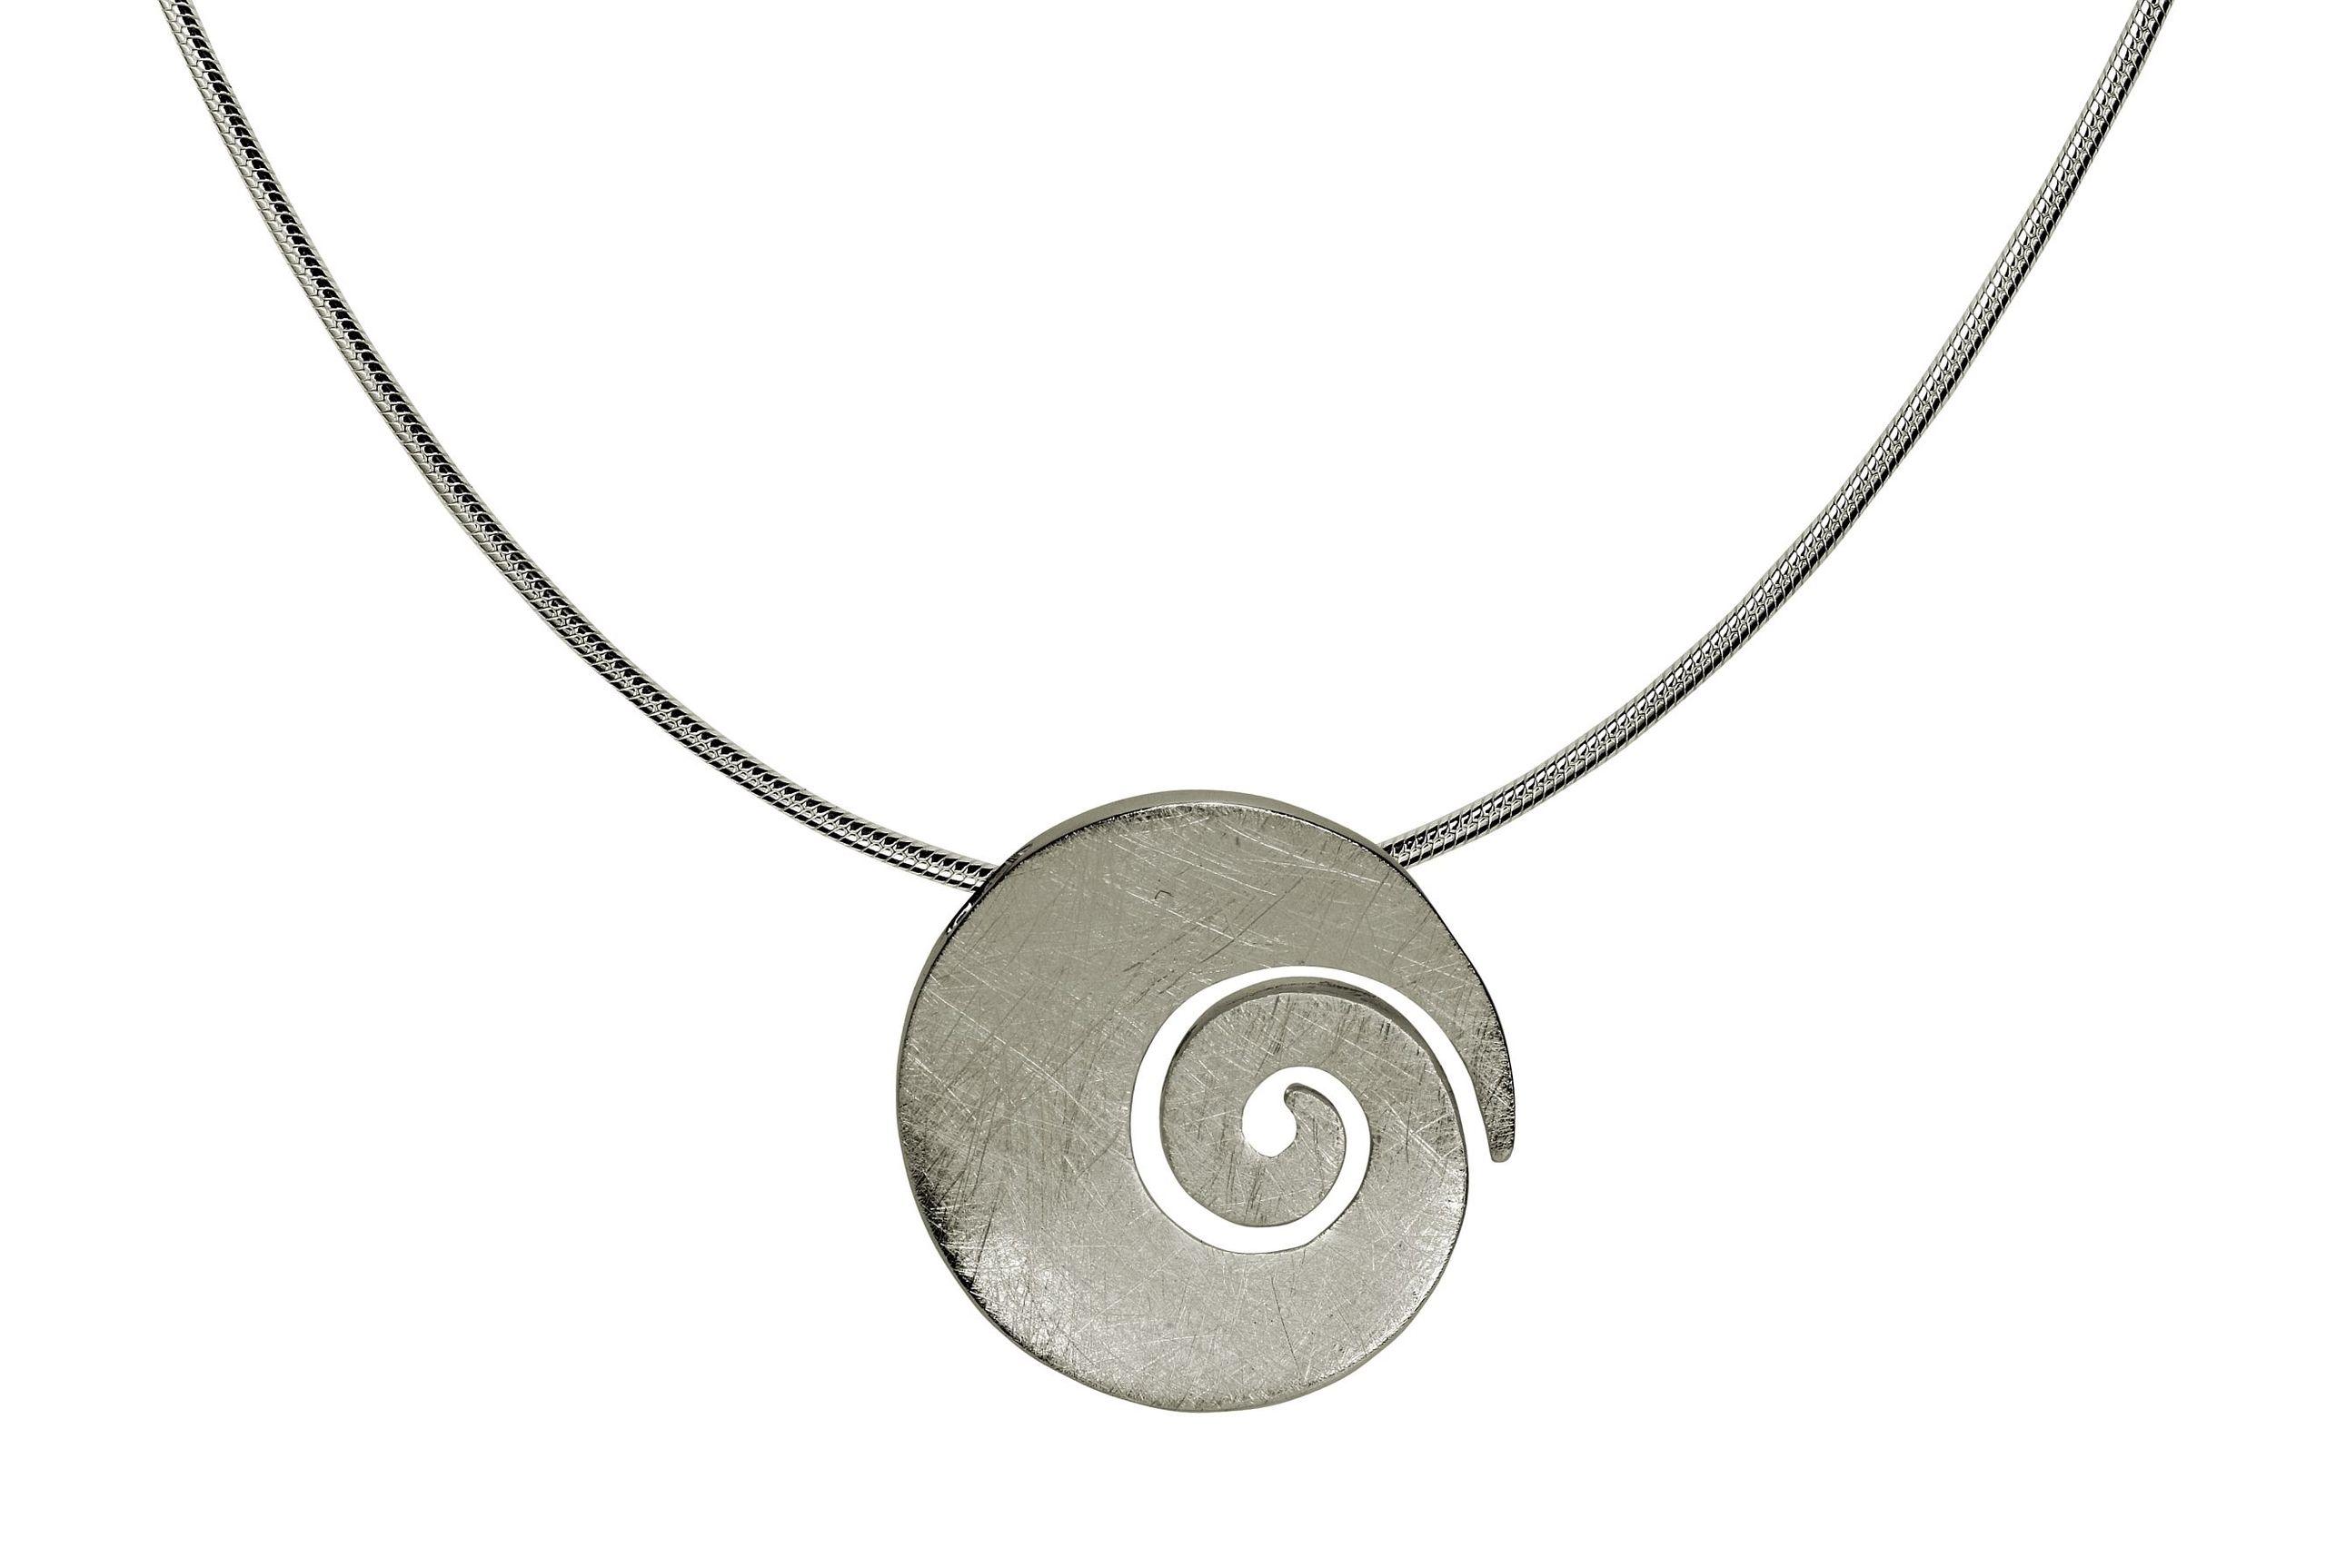 782692b53a7d SILBERMOOS Colgante con collar gran círculo espiral redondo abierto  cepillado con collar serpiente de 45 cm